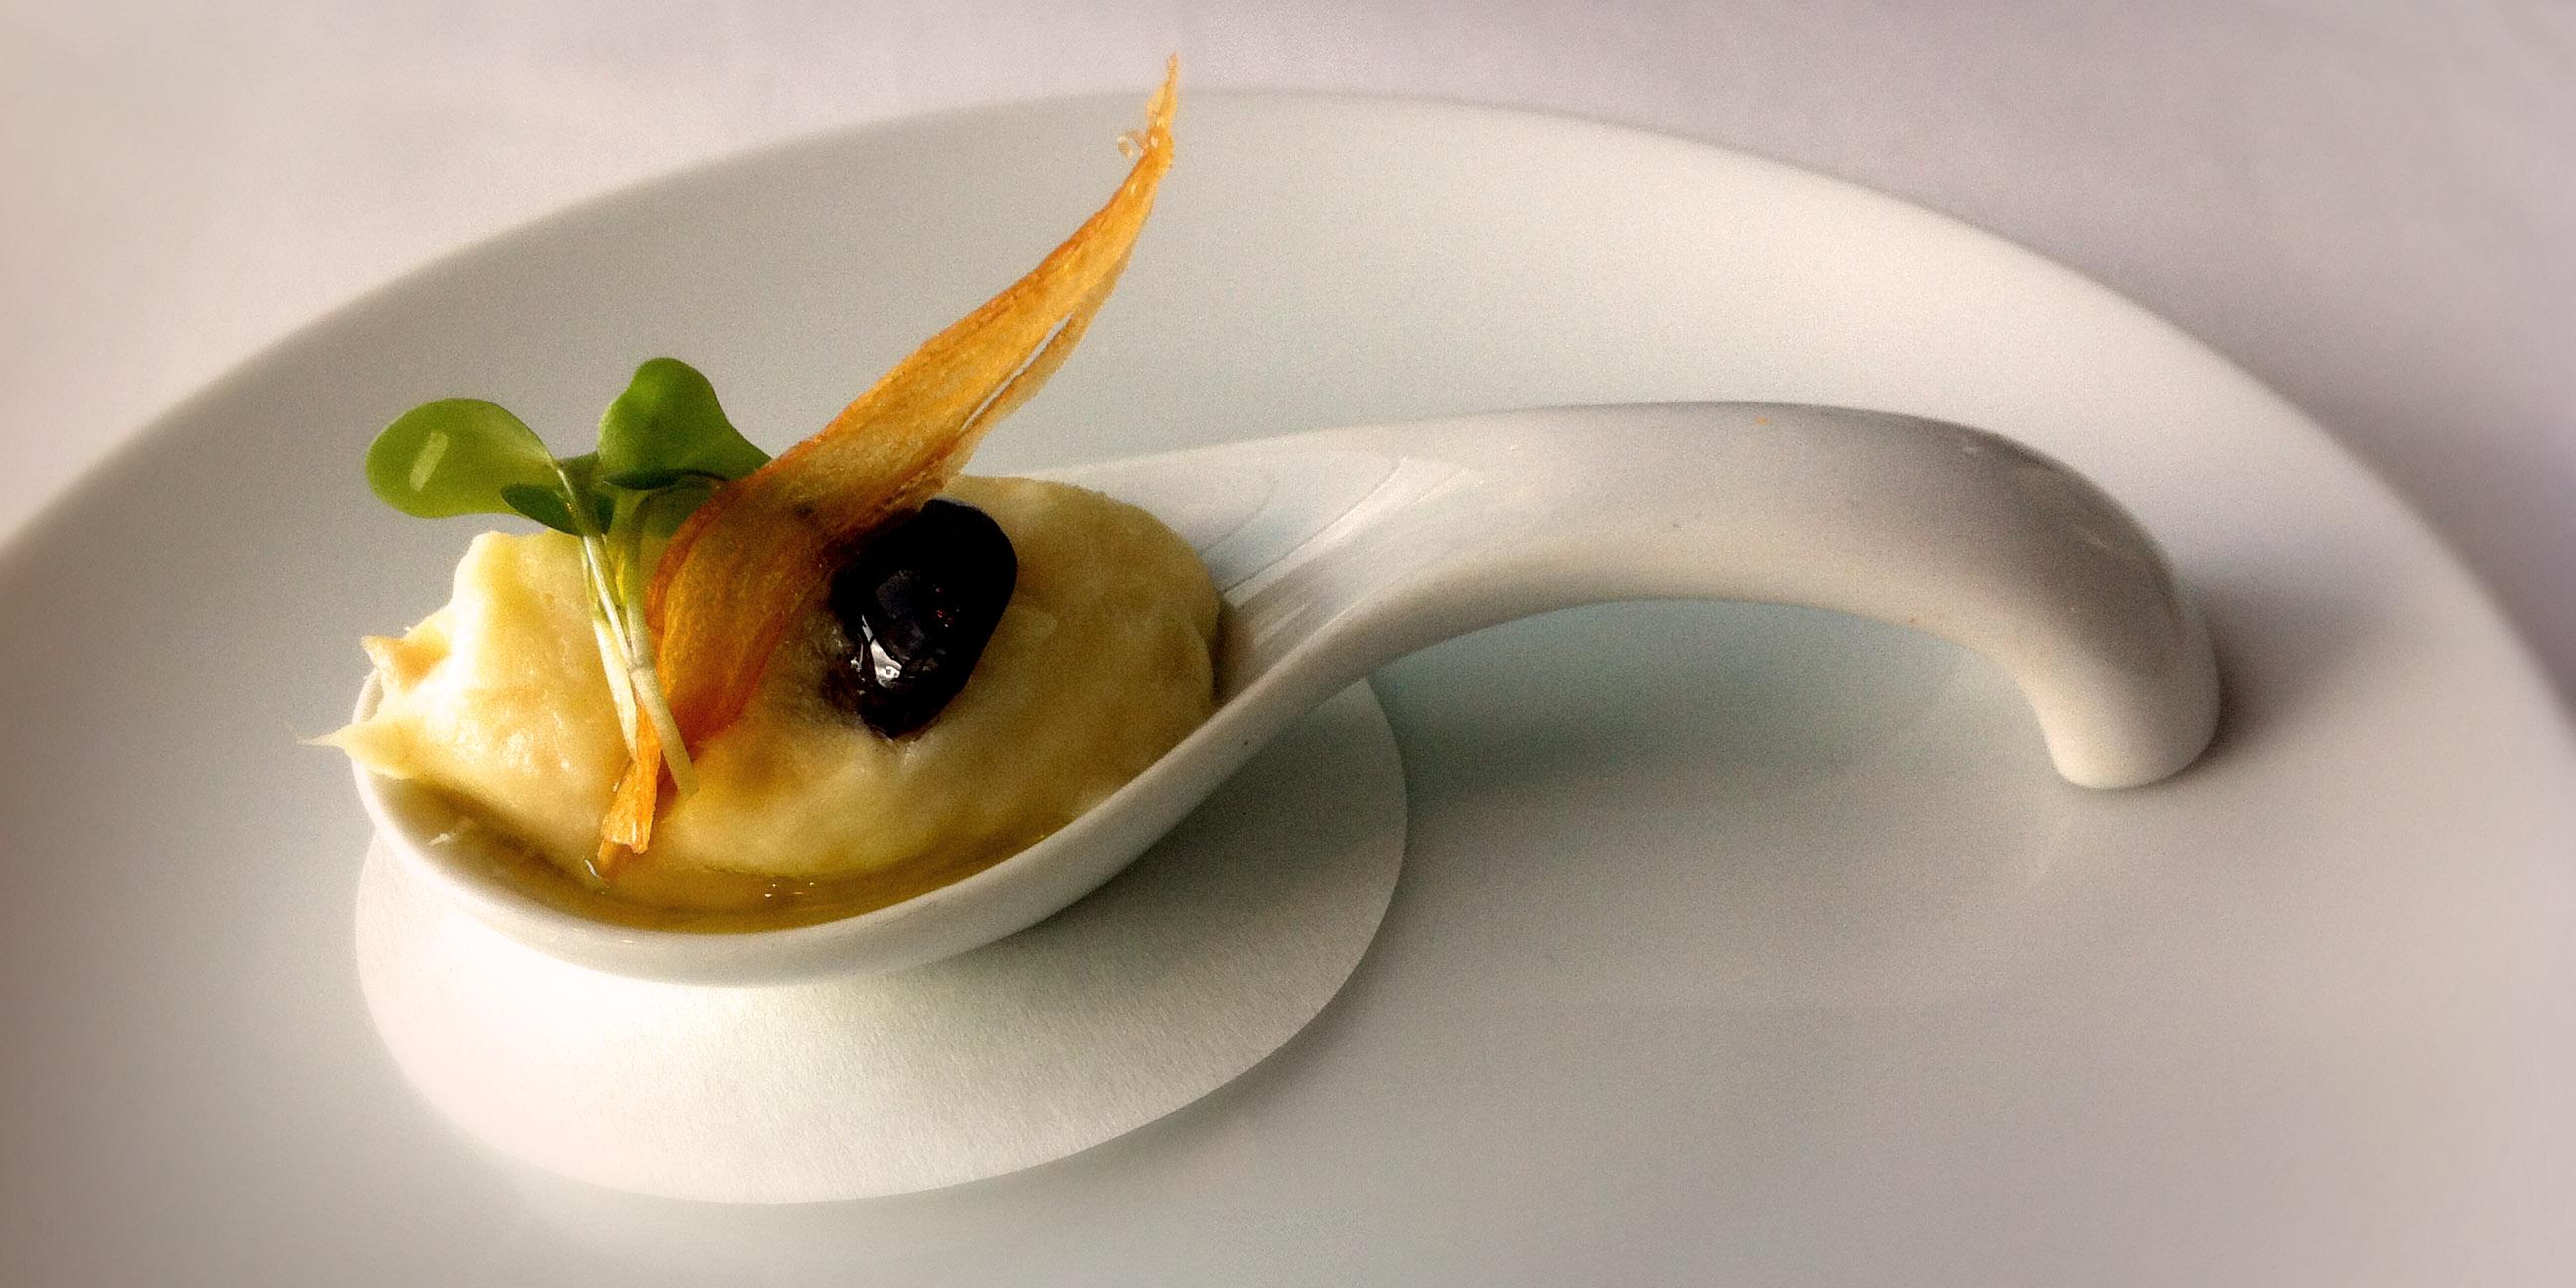 Fine dining judskii for Amuse bouche cuisine